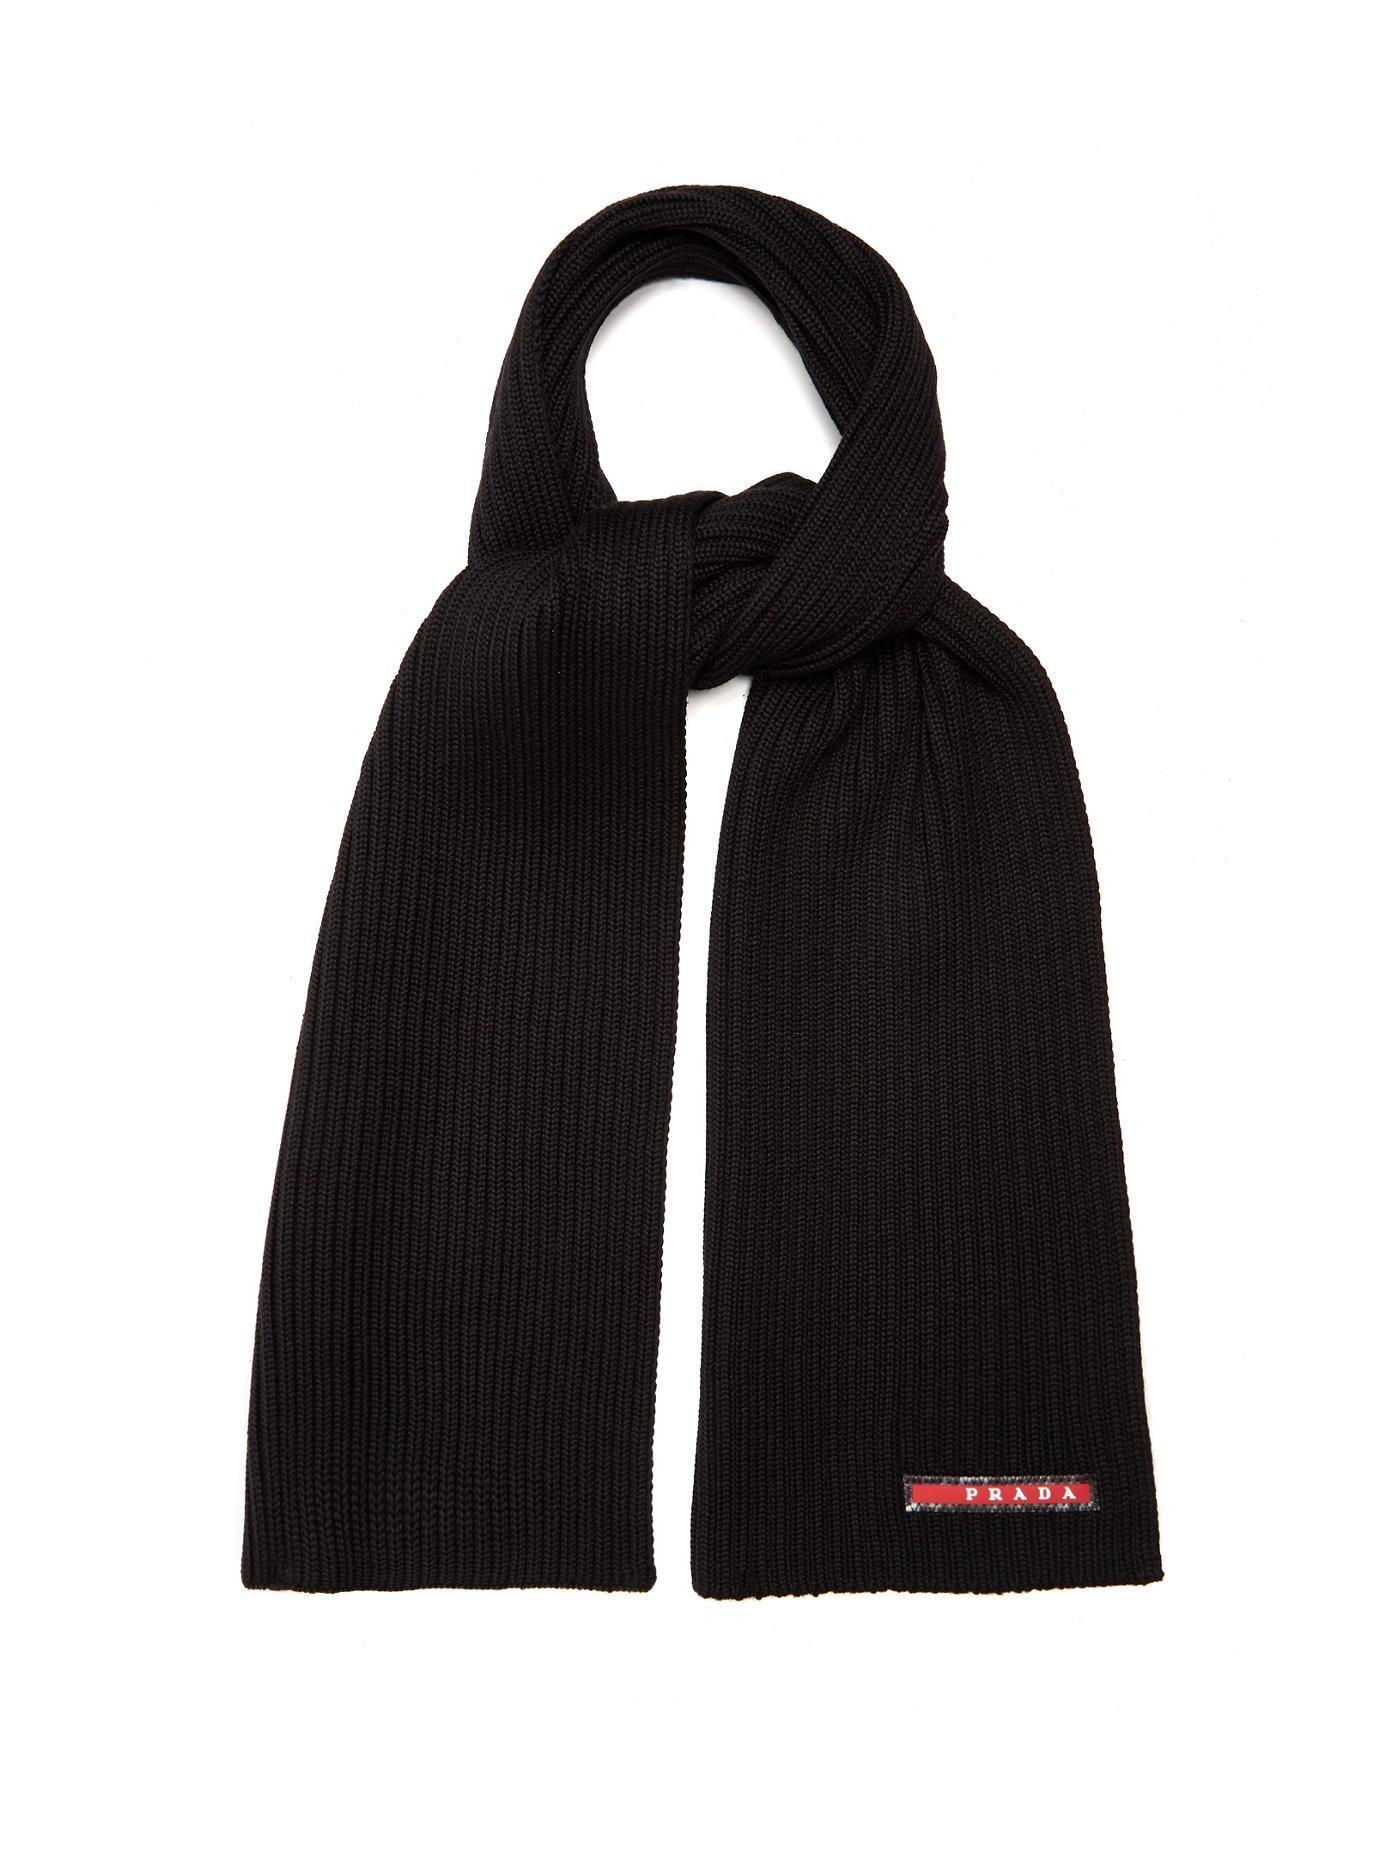 Prada Ribbed-Knit Wool Scarf In Black